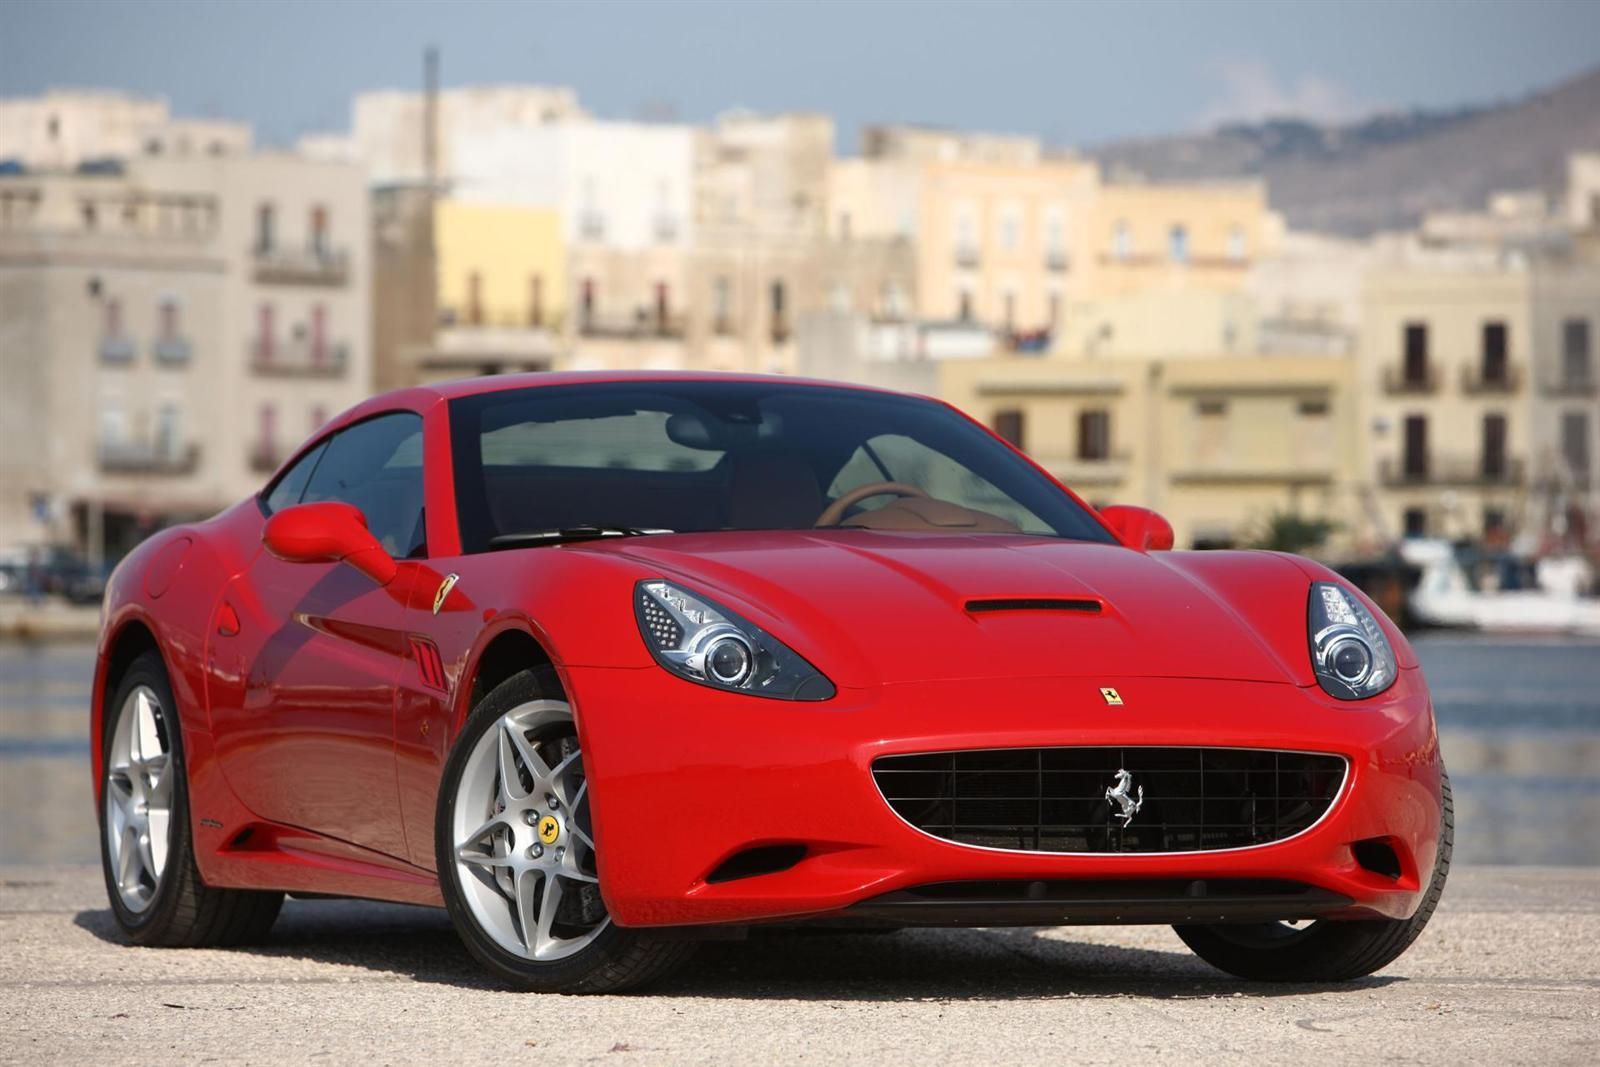 Ferrari California 2014 Ferrari California Ferrari Car Sports Cars Luxury